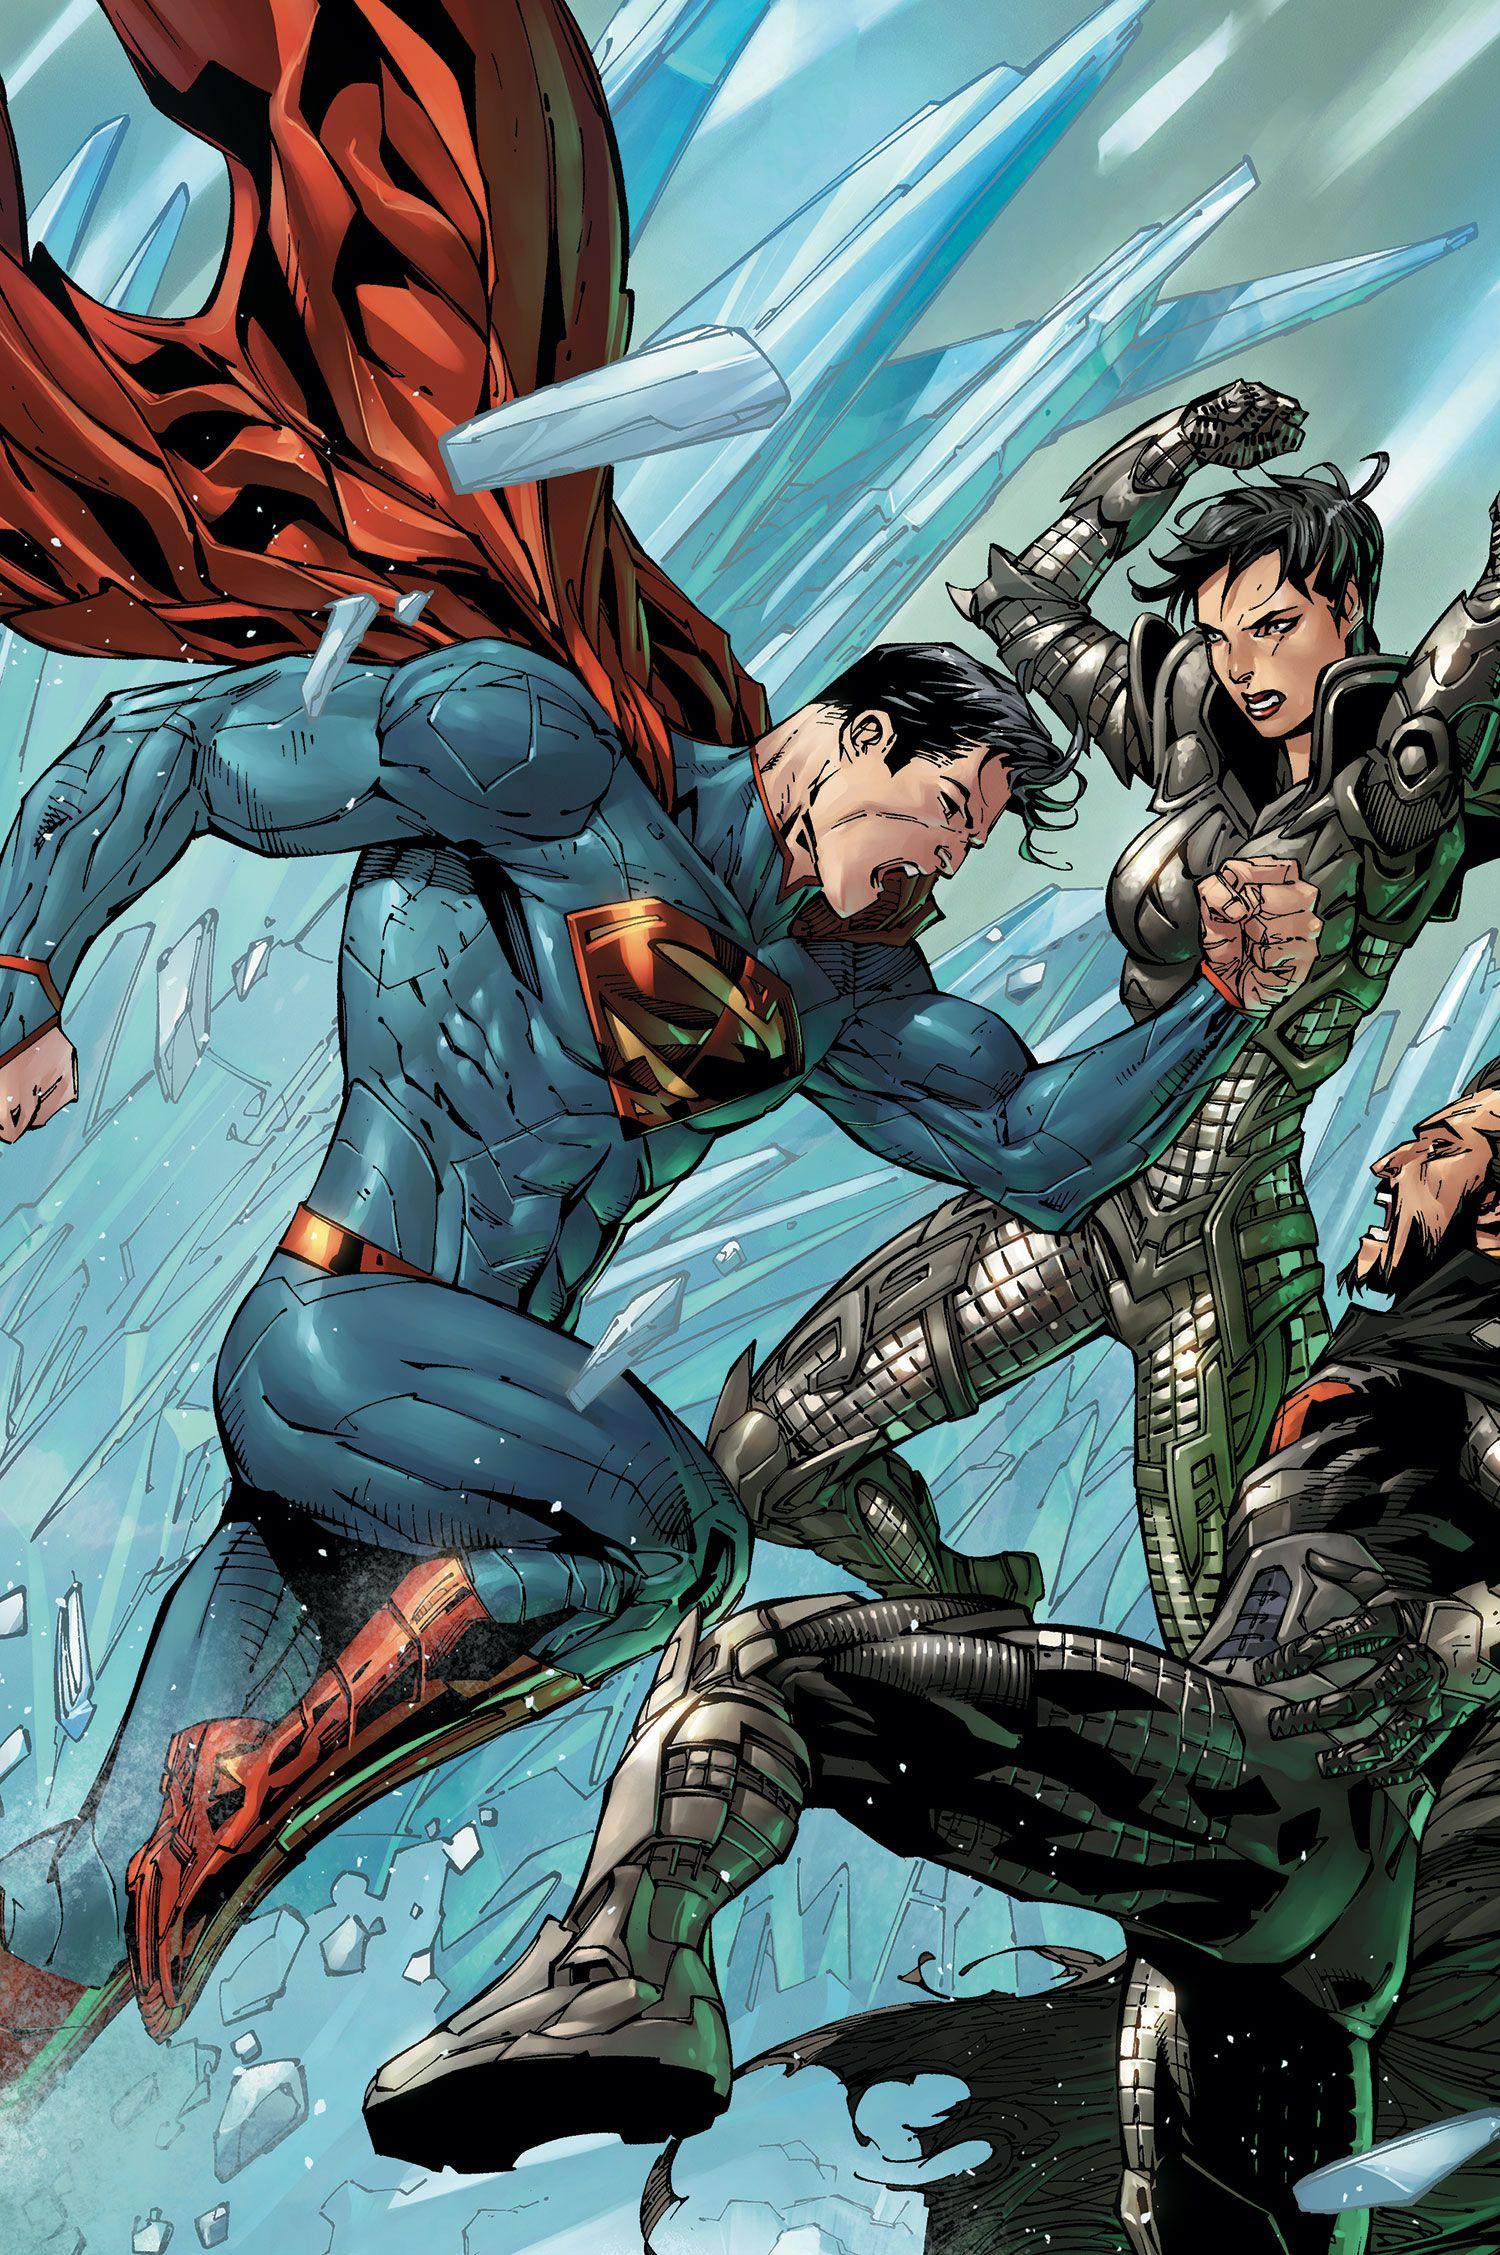 #Superman #Fan #Art. (Superman Wonder Woman Vol.1 #5 Cover) By: Tony S. Daniel,Sandu Florea,Tomeu. (THE * 5 * STÅR * ÅWARD * OF: * AW YEAH, IT'S MAJOR ÅWESOMENESS!!!™)[THANK U 4 PINNING!!!<·><]<©>ÅÅÅ+(OB4E)